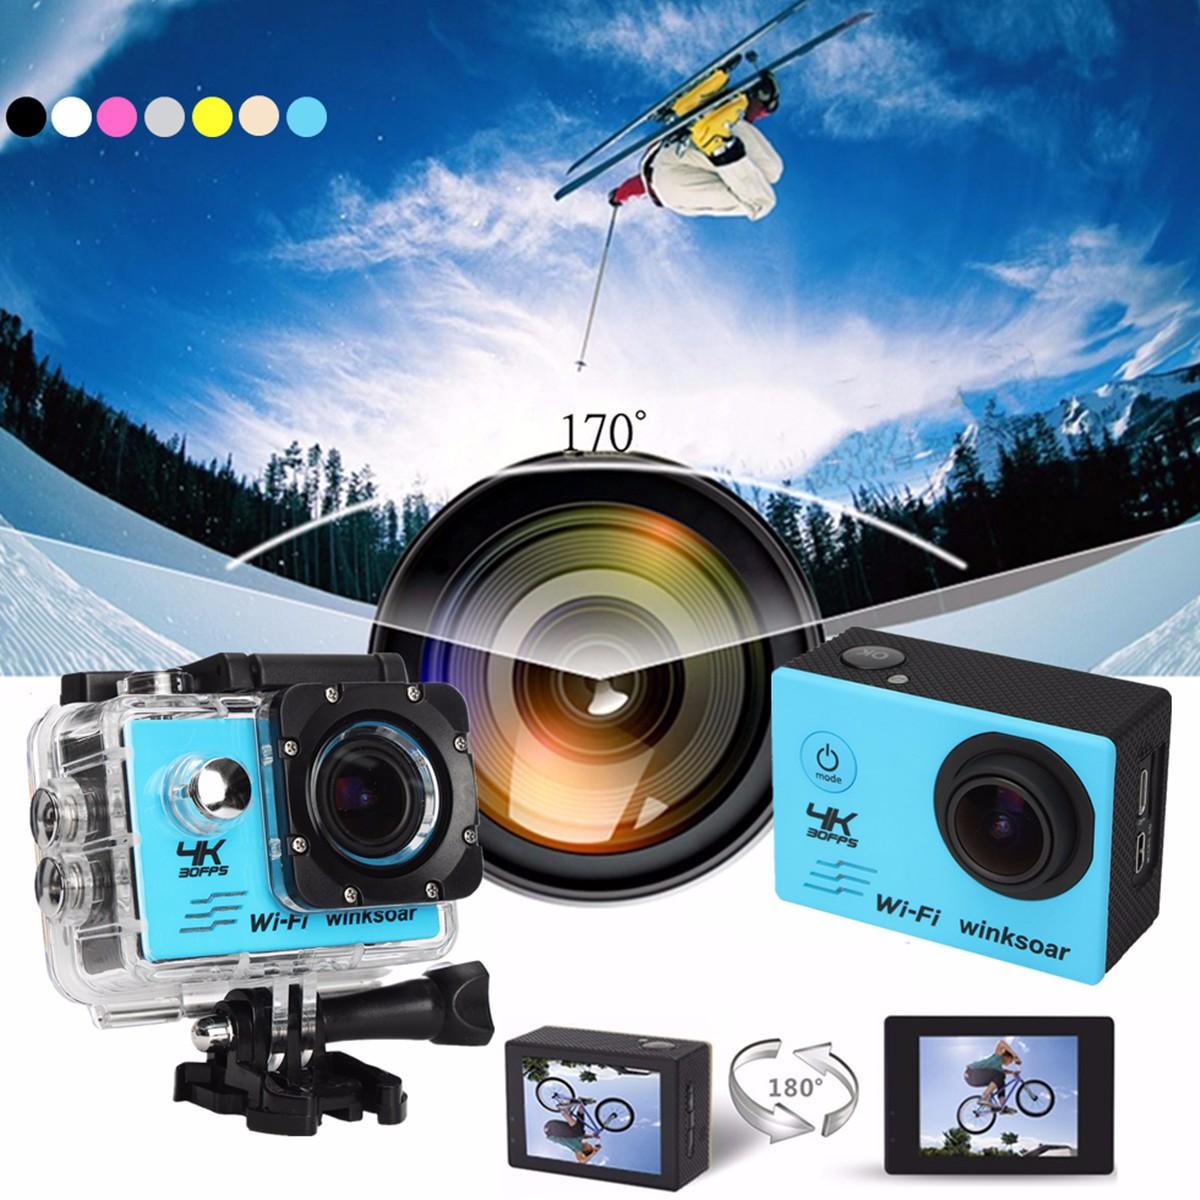 Winksoar SJ9000 Sports Action Camera WiFi HD 4K 1080P 16MP 120° Angle 2-inch Screen Mini DV Recorder Waterproof DV Camcorder Birthday New Year Christmas Gifts